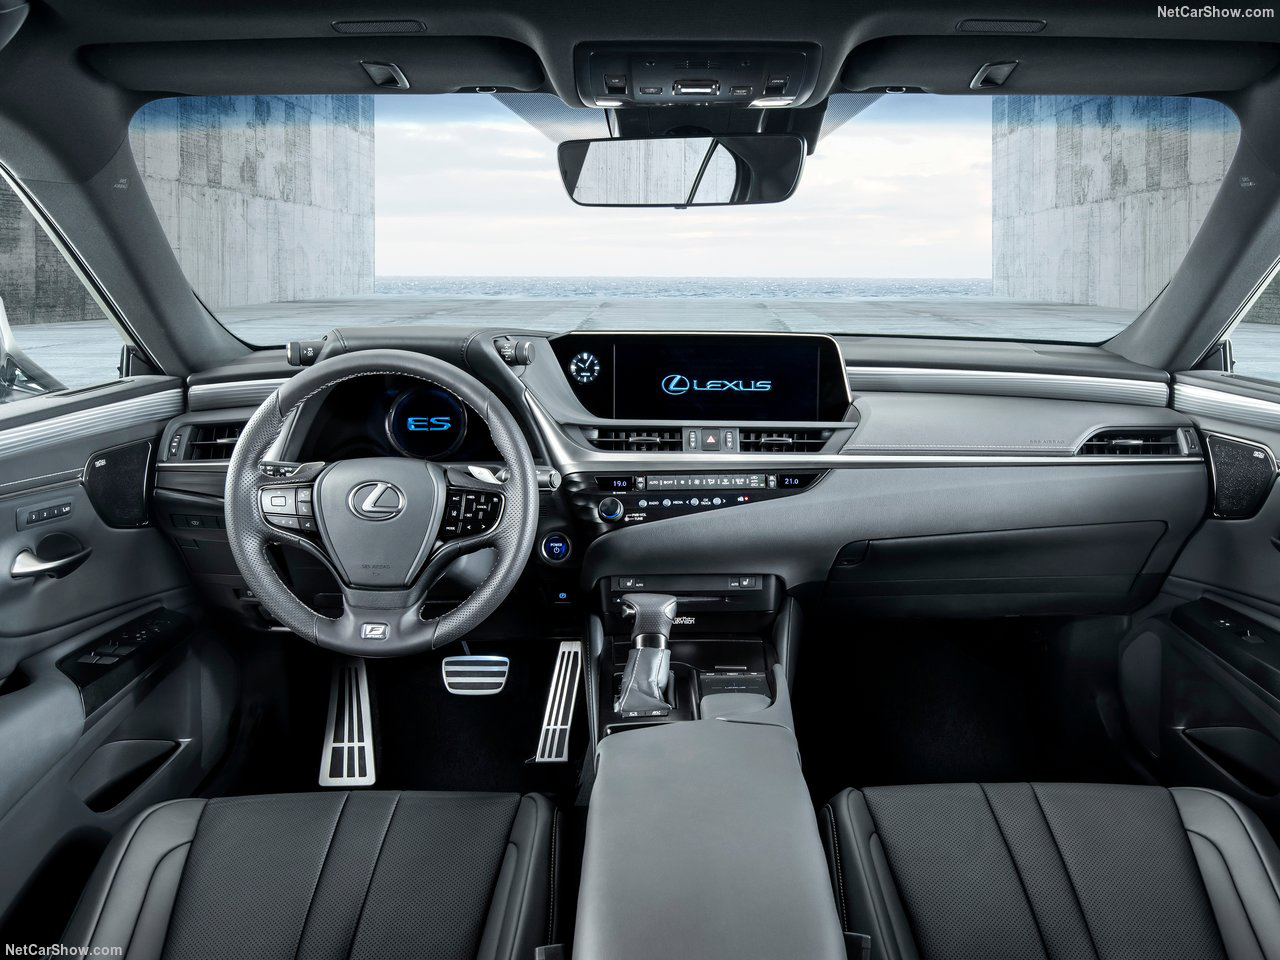 LexusES43.jpg